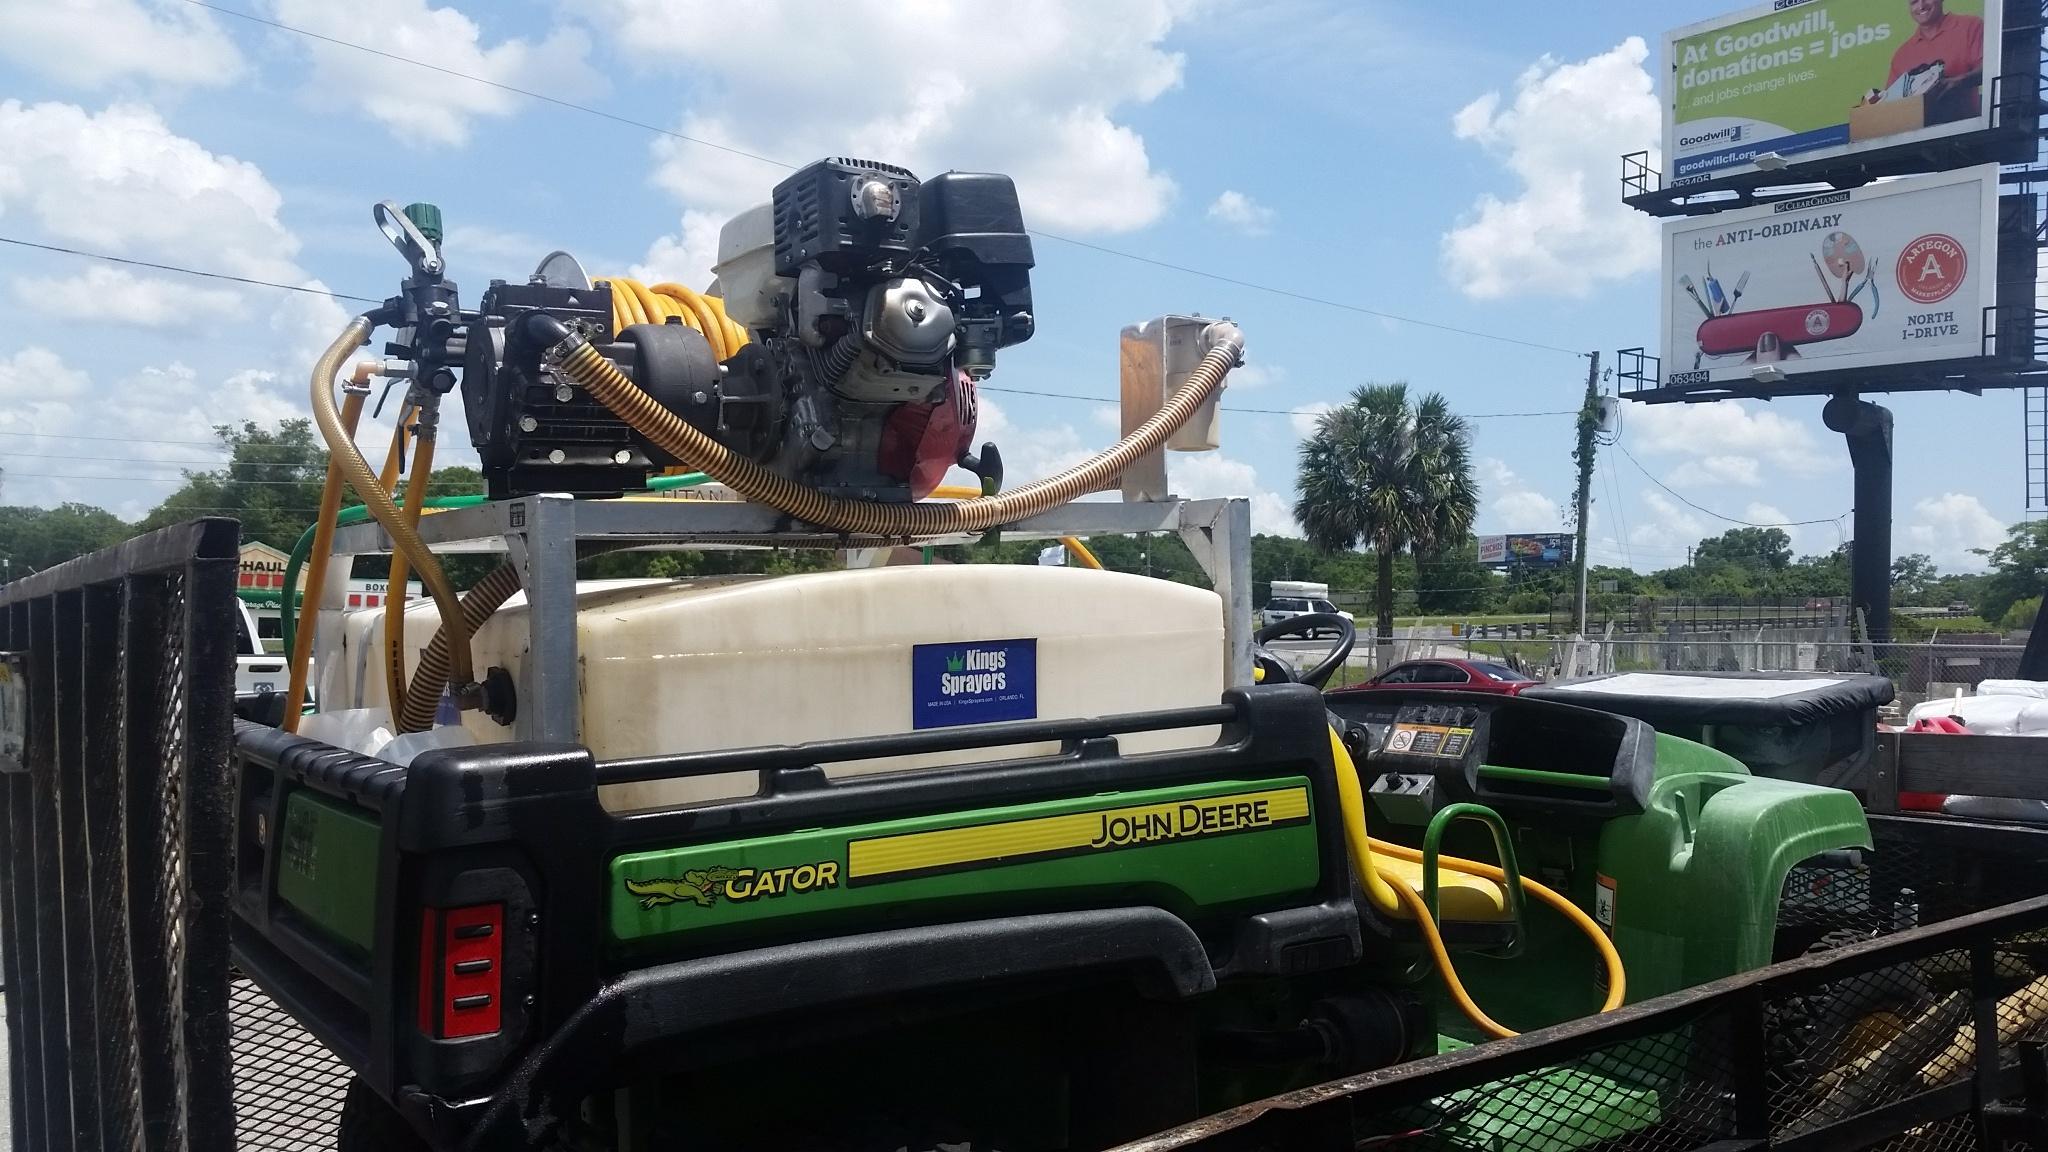 John Deere Gator with a mounted skid sprayer.jpg